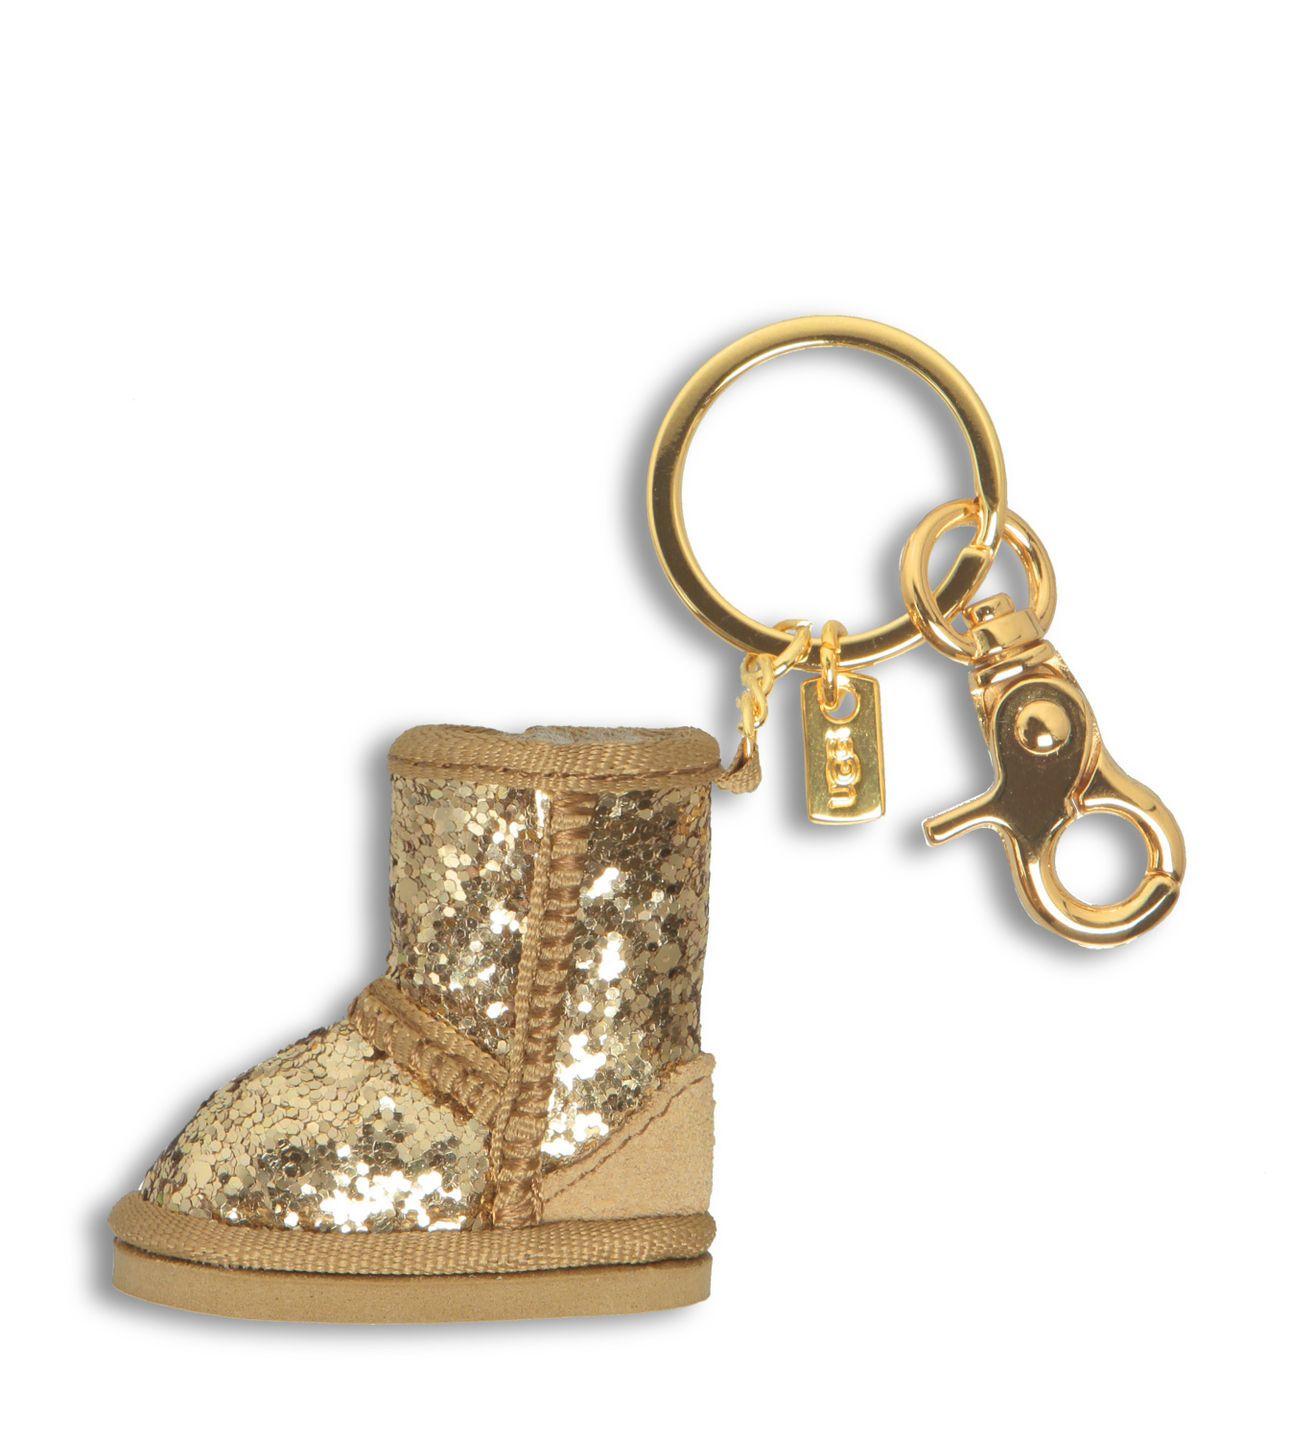 Ugg Boot Keychain. Hint Christmas Present